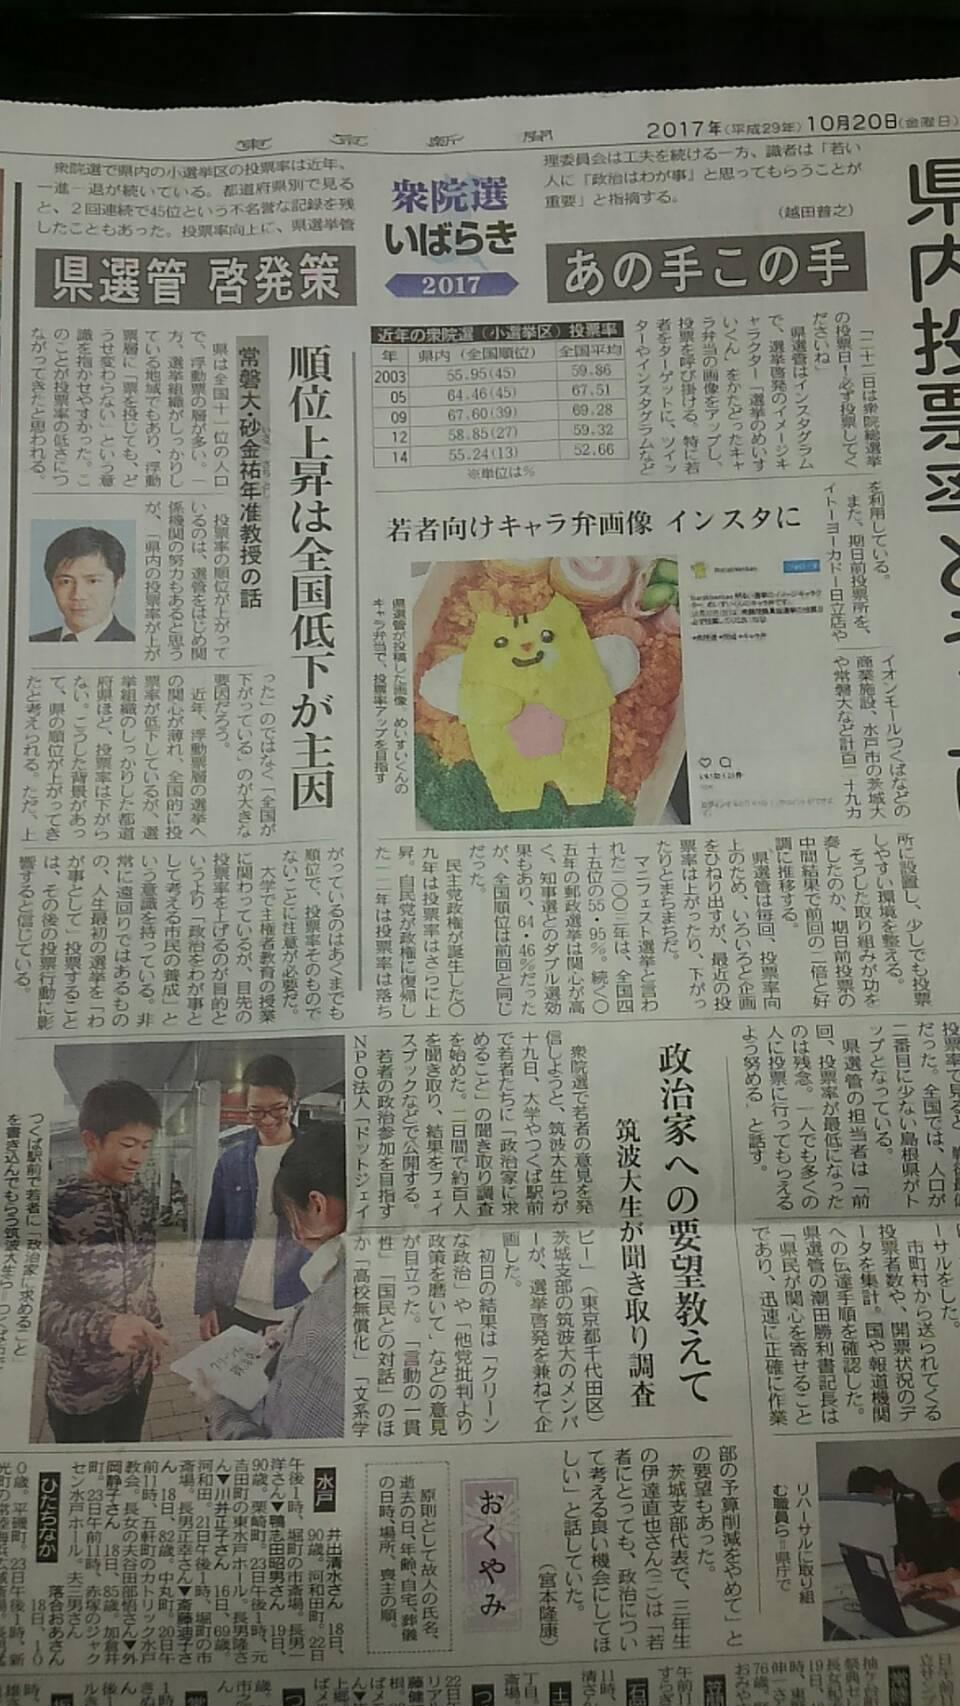 171020【40thつくば】東京新聞